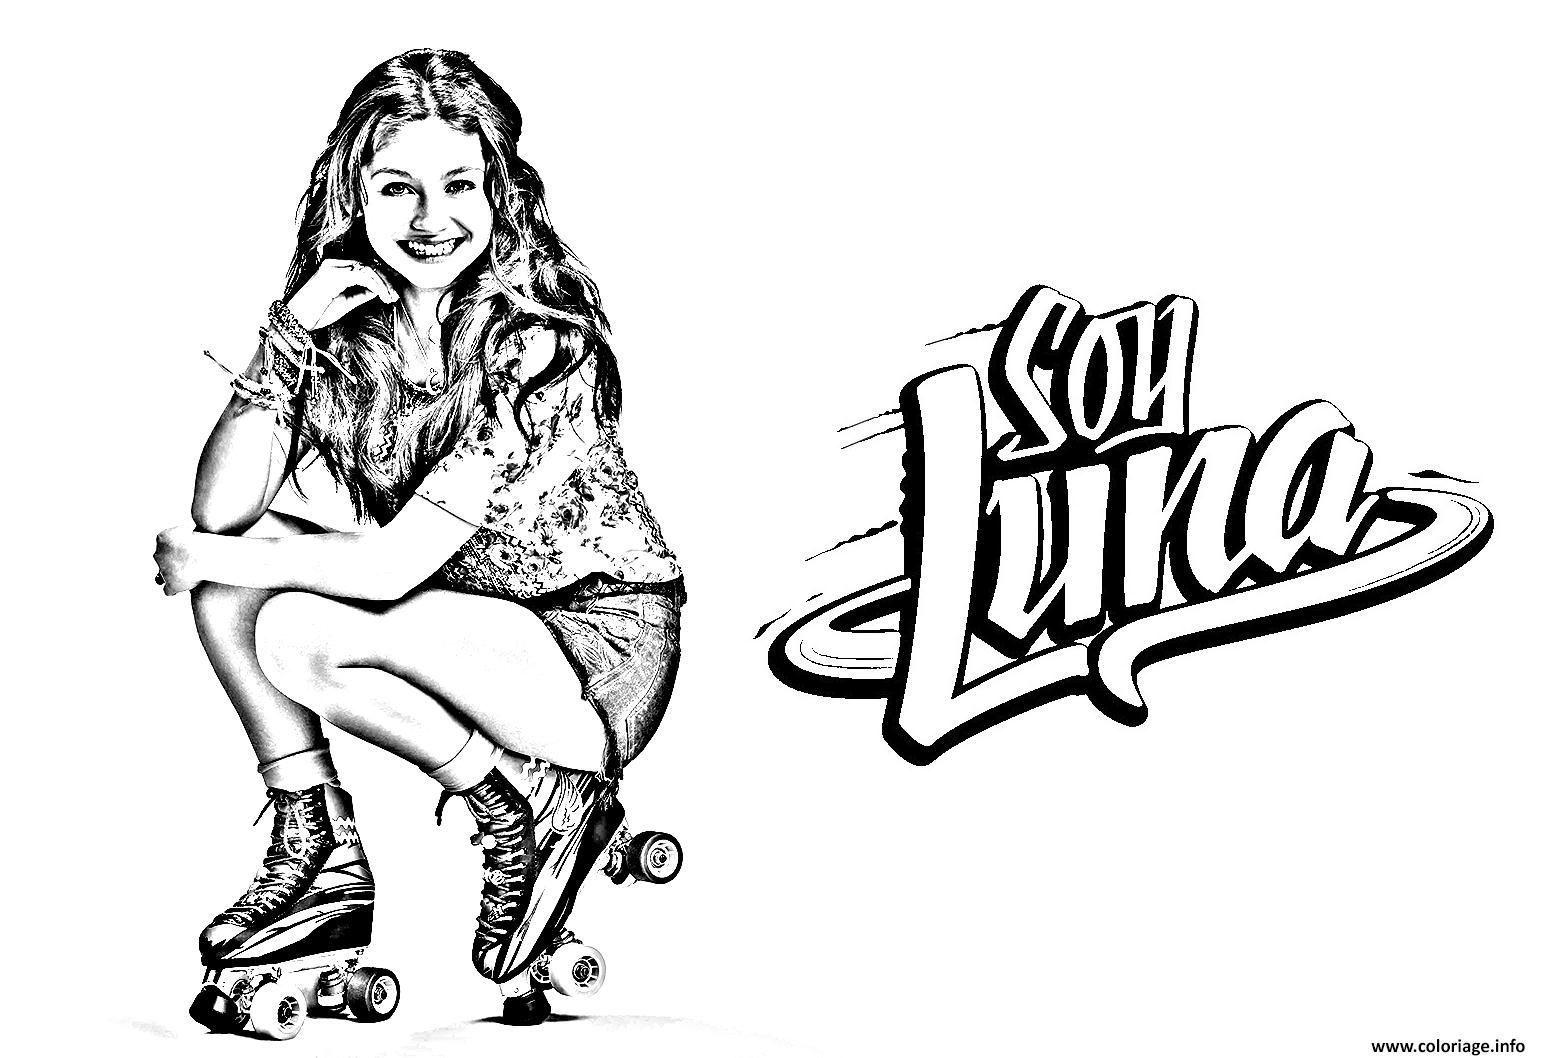 Coloriage Soy Luna Imprimer Coloring Pages Free Printable Coloring Pages Desktop Pictures